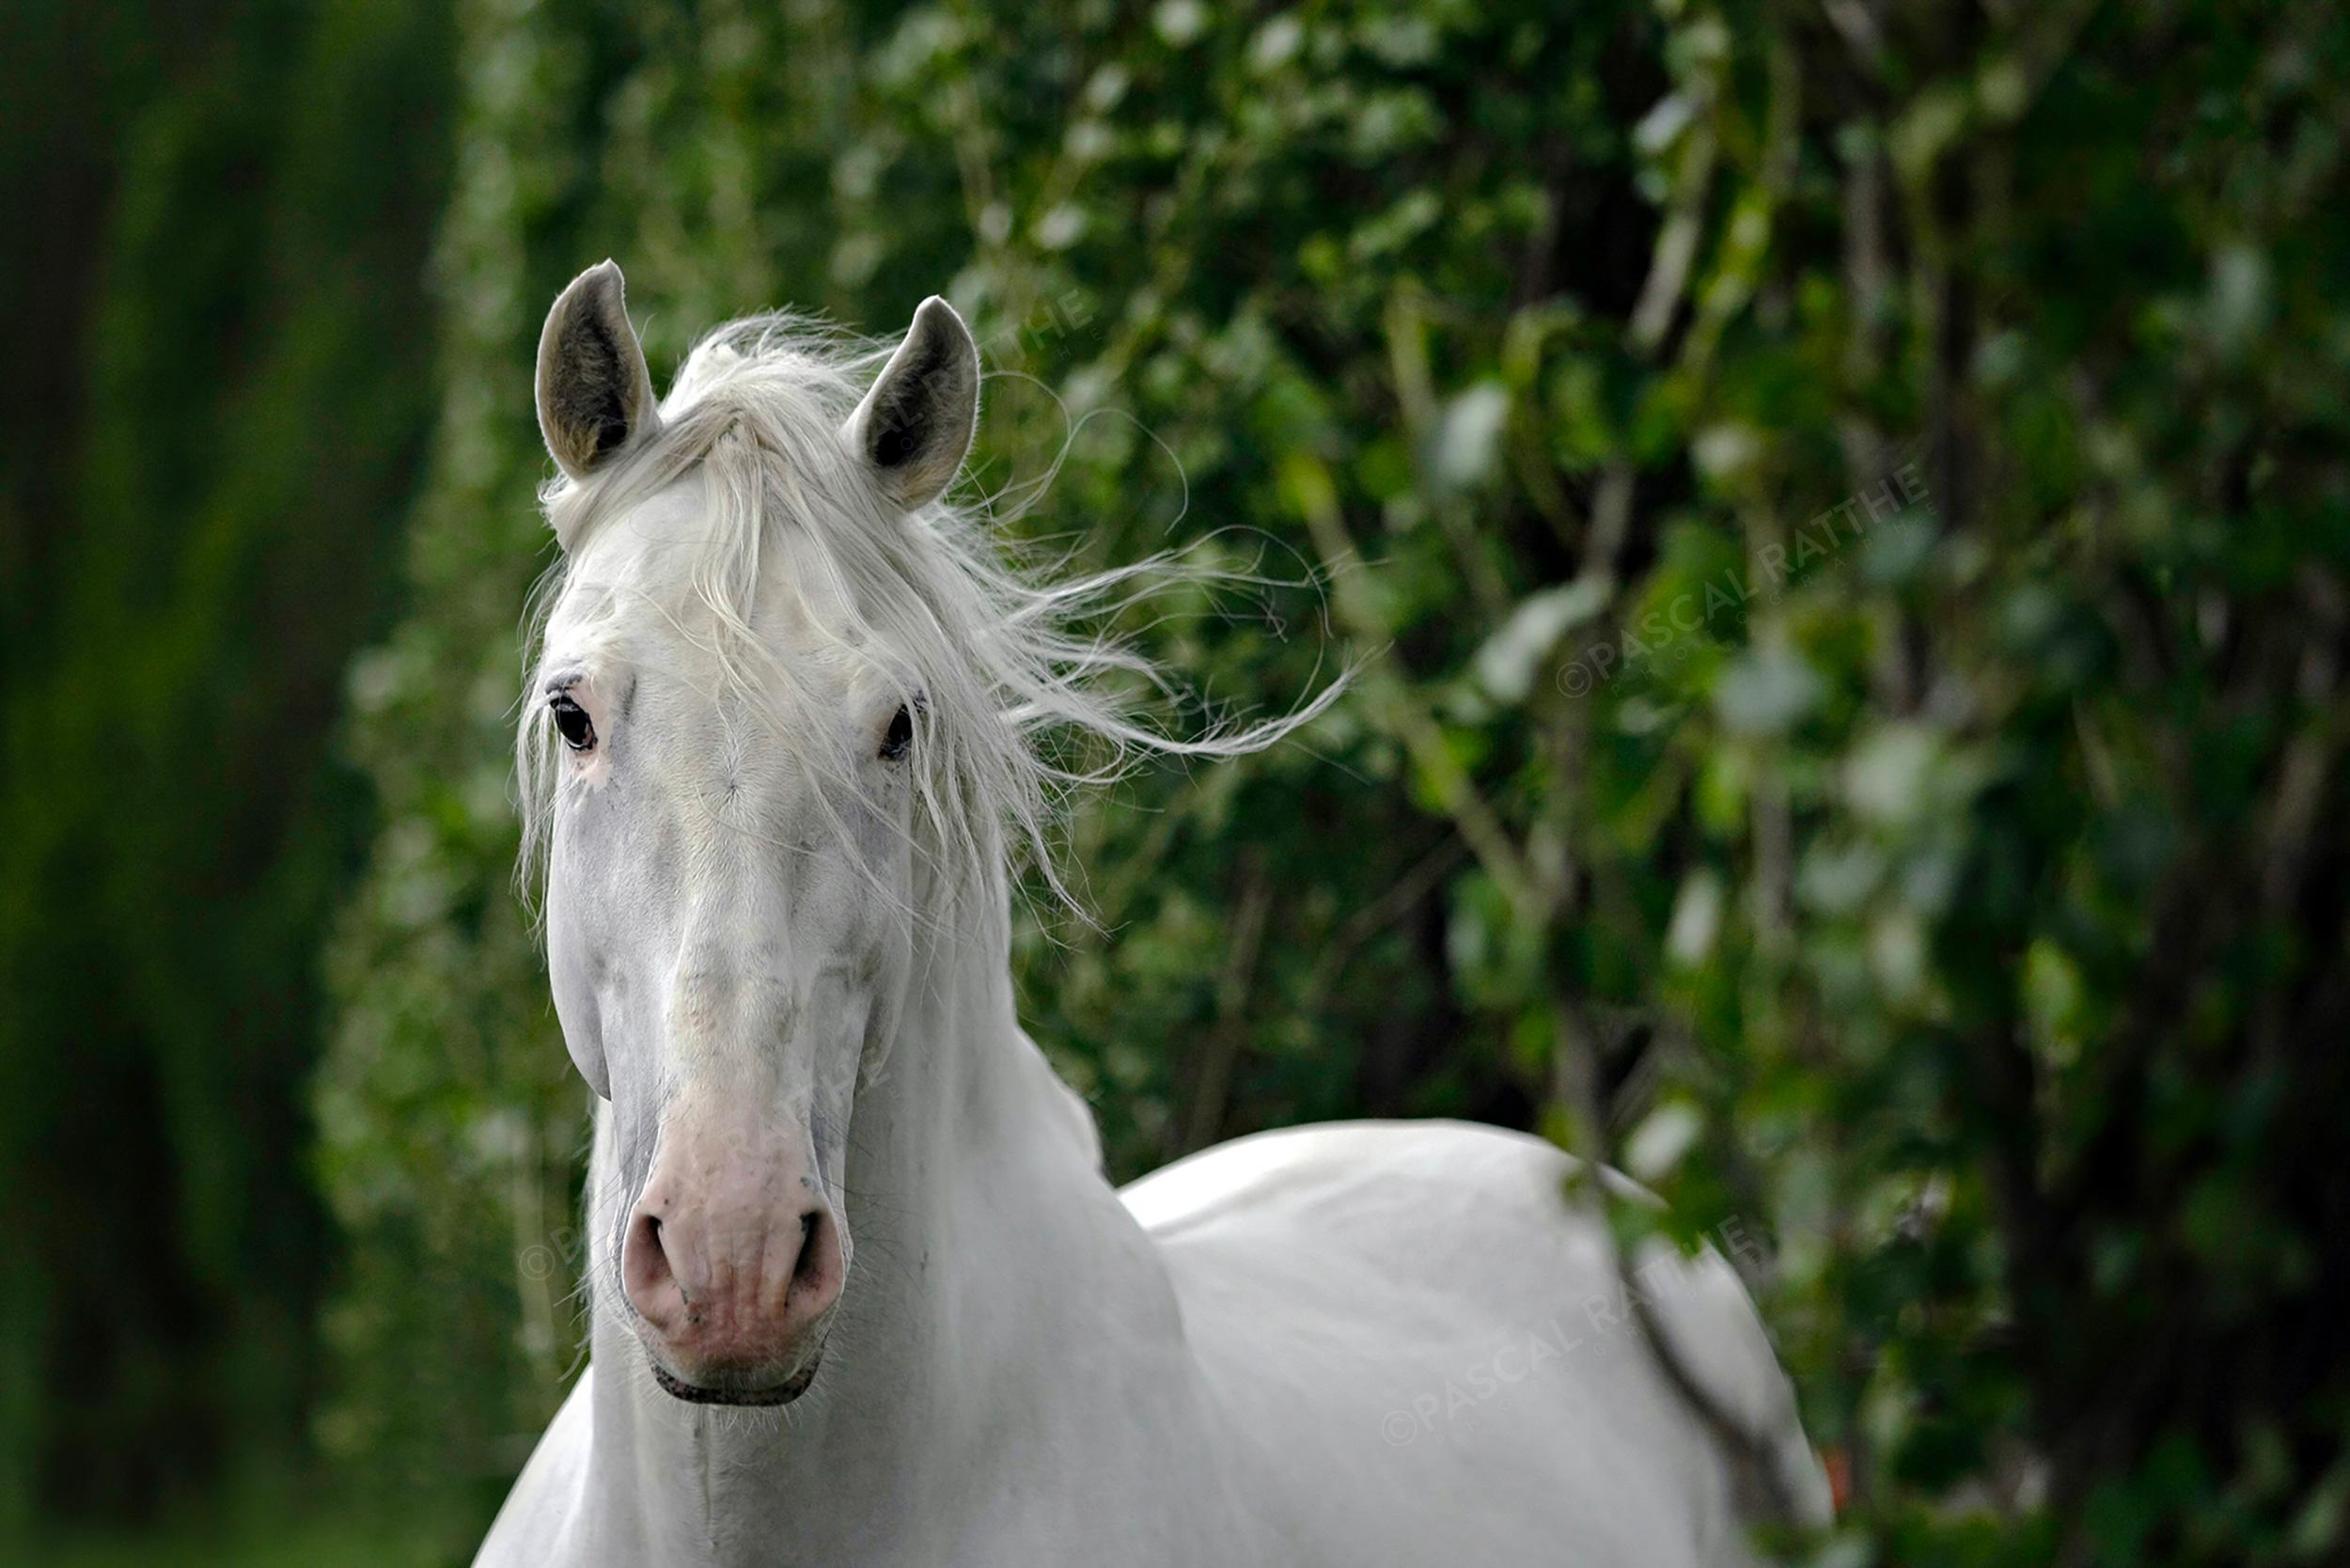 Un cheval blanc nous regarde de face